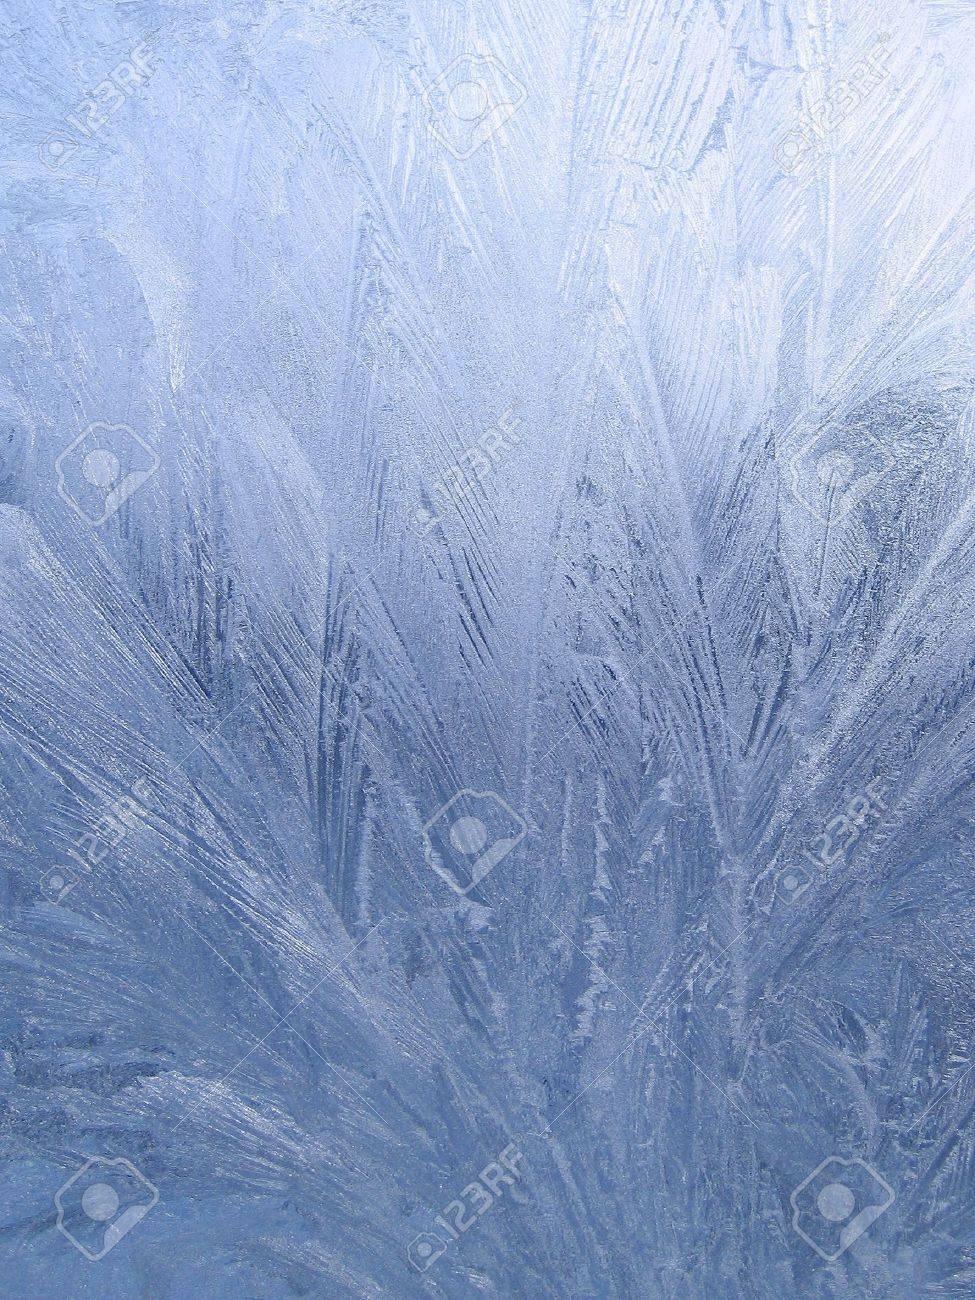 blue frosty natural pattern on winter window - 7757327